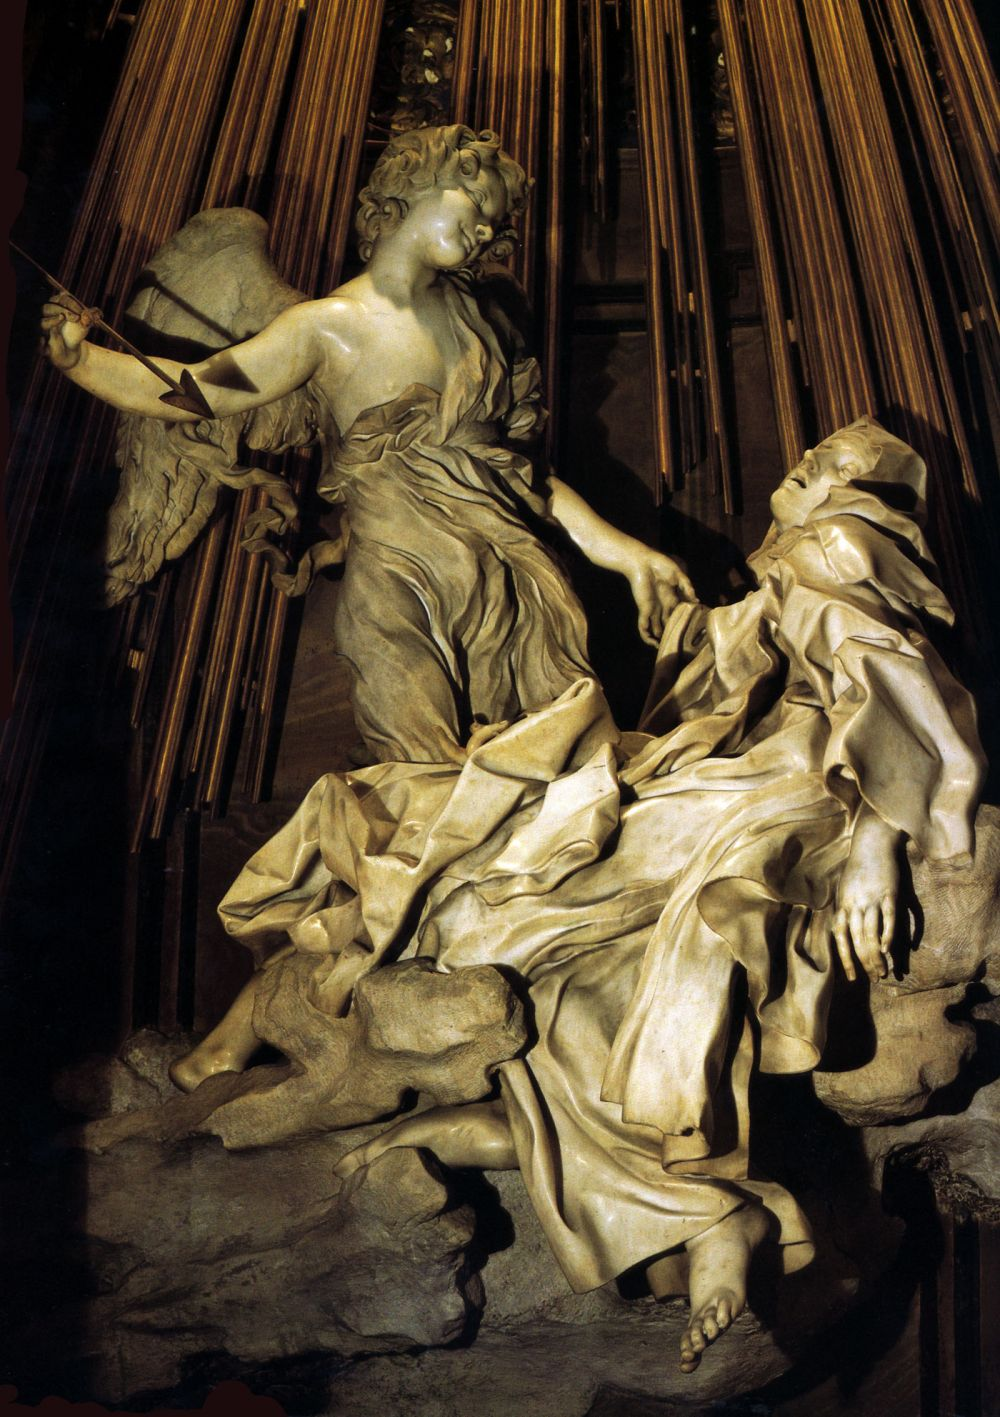 Mujeres. Mitologías Lorenzo Bernini,Extase de Sainte Thérèse, 1645-1652.